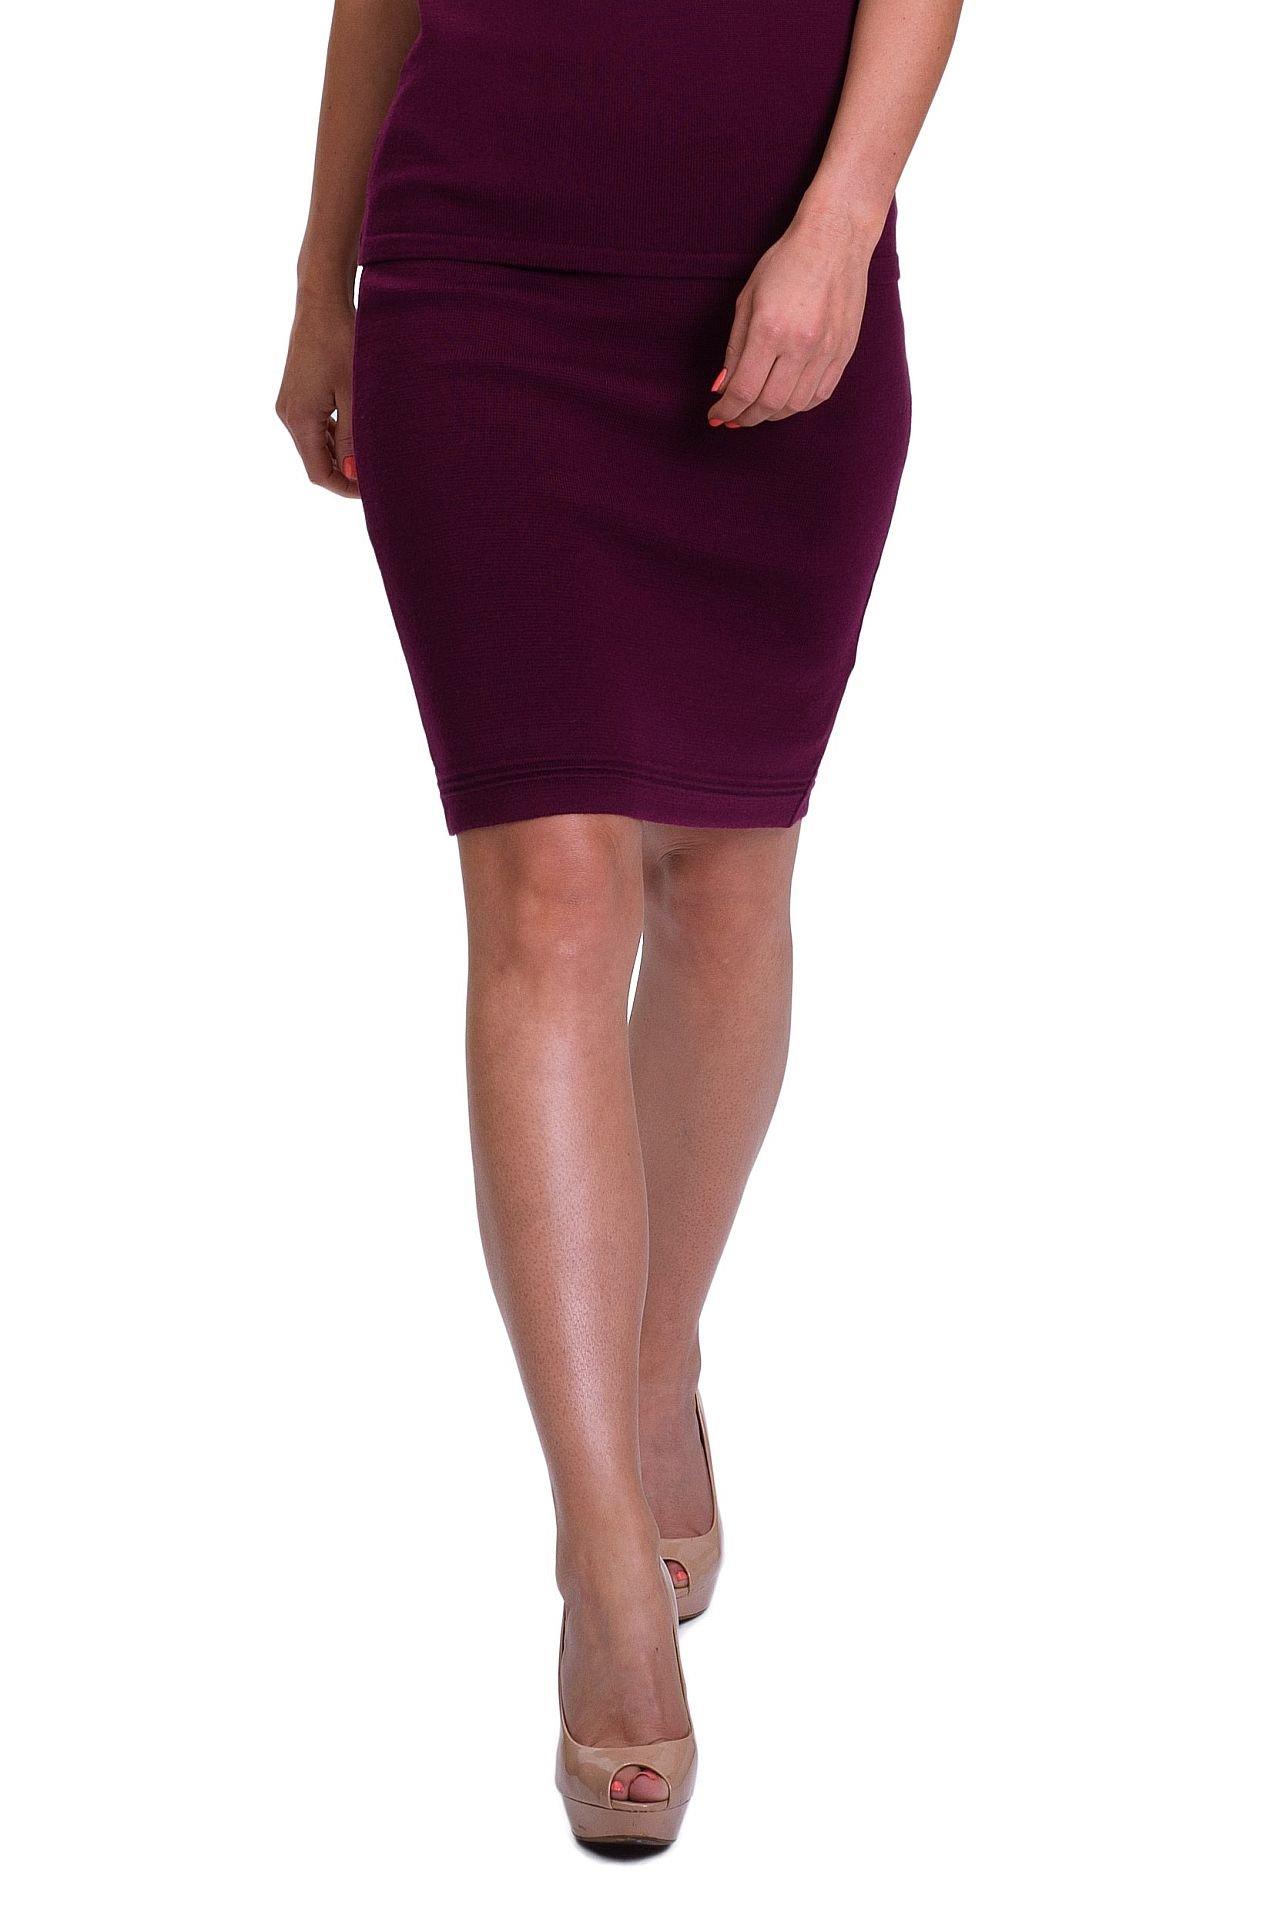 KNITTONS Women's 100% Italian Merino Wool High Waisted Wool Pencil Skirt (S, Burgundy)